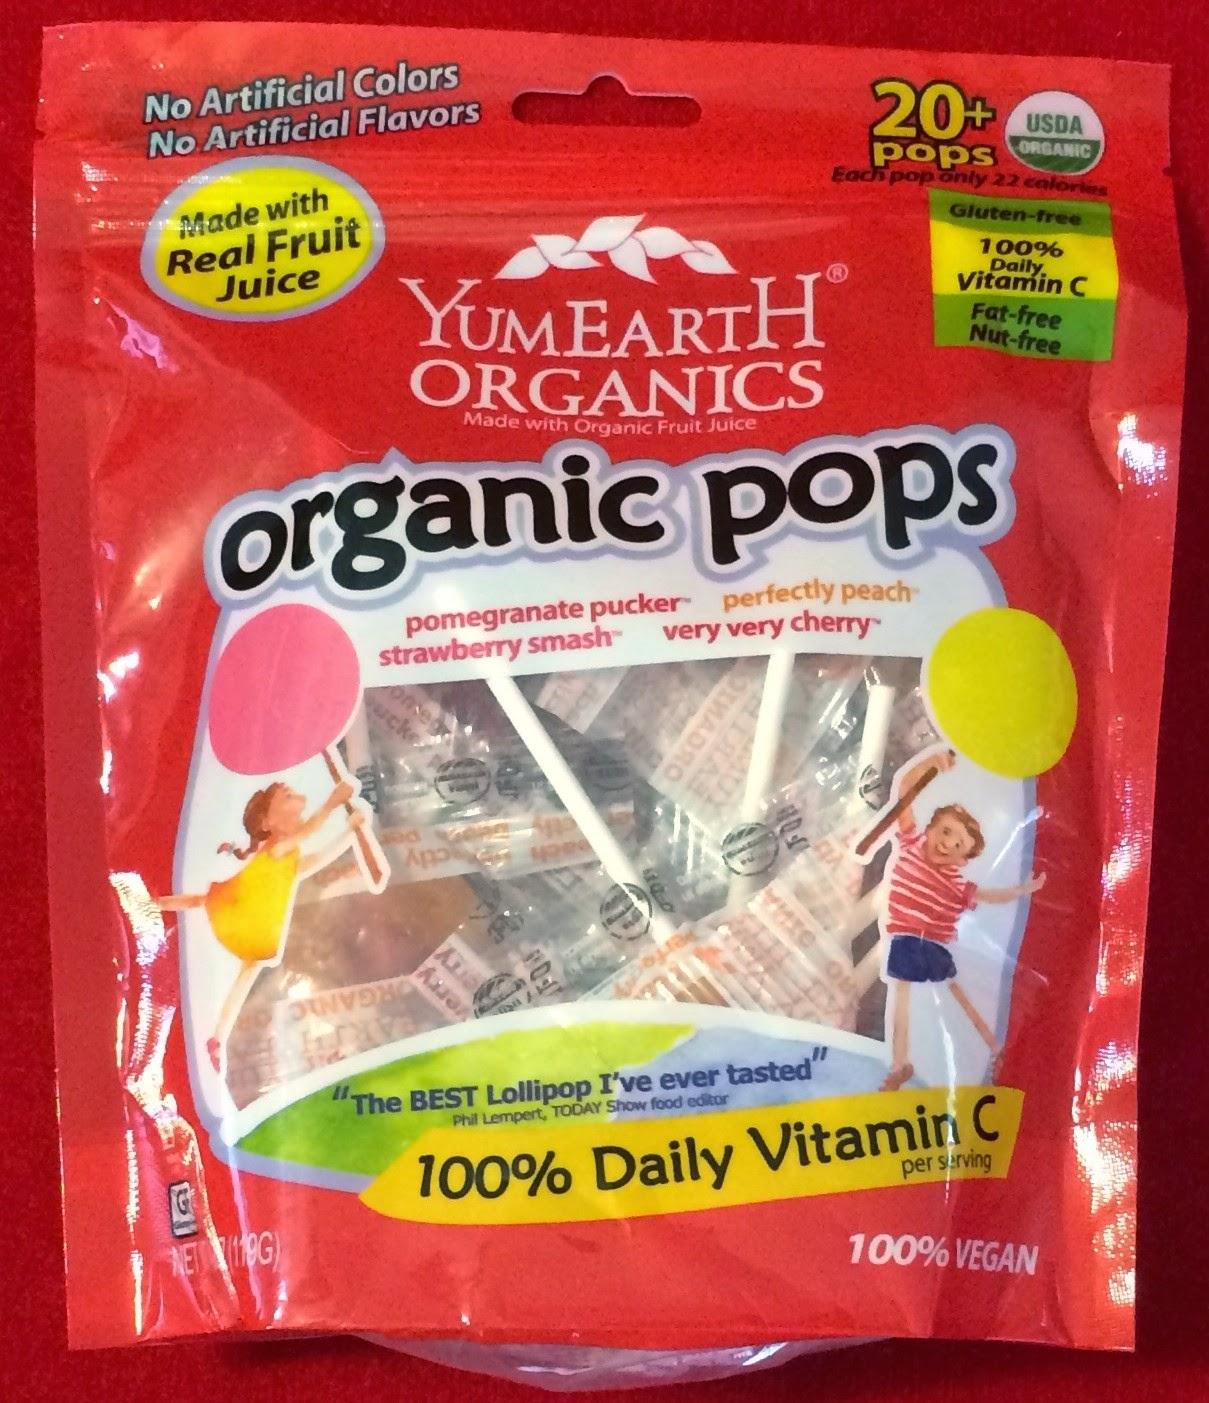 http://stacytilton.blogspot.com/2014/11/holiday-gift-guide-yumearth-organics.html